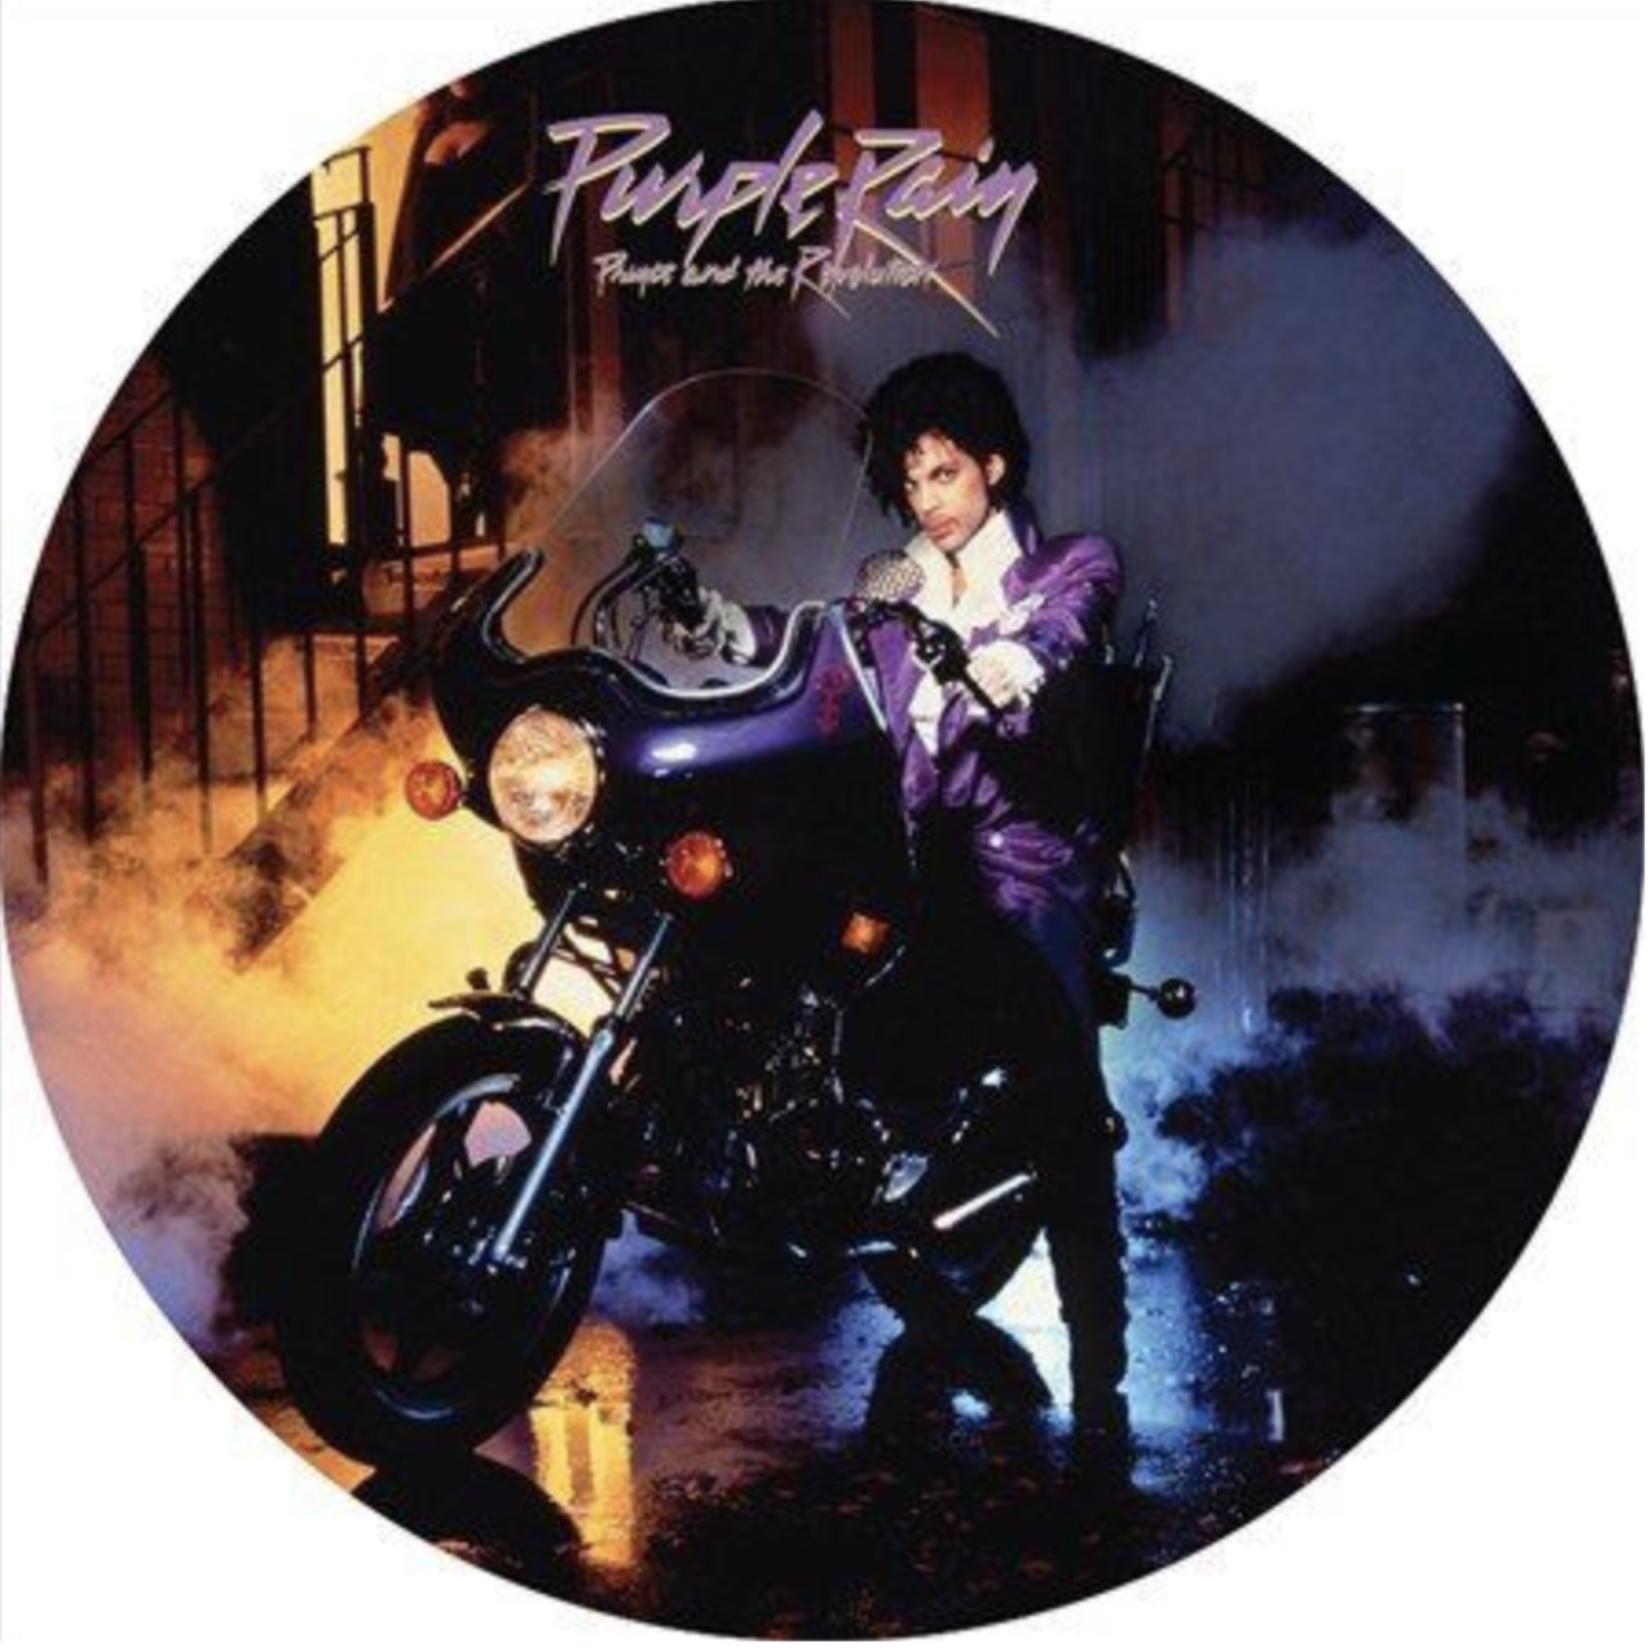 Monostereo Prince and the Revolution Purple Rain (Picture Disc)